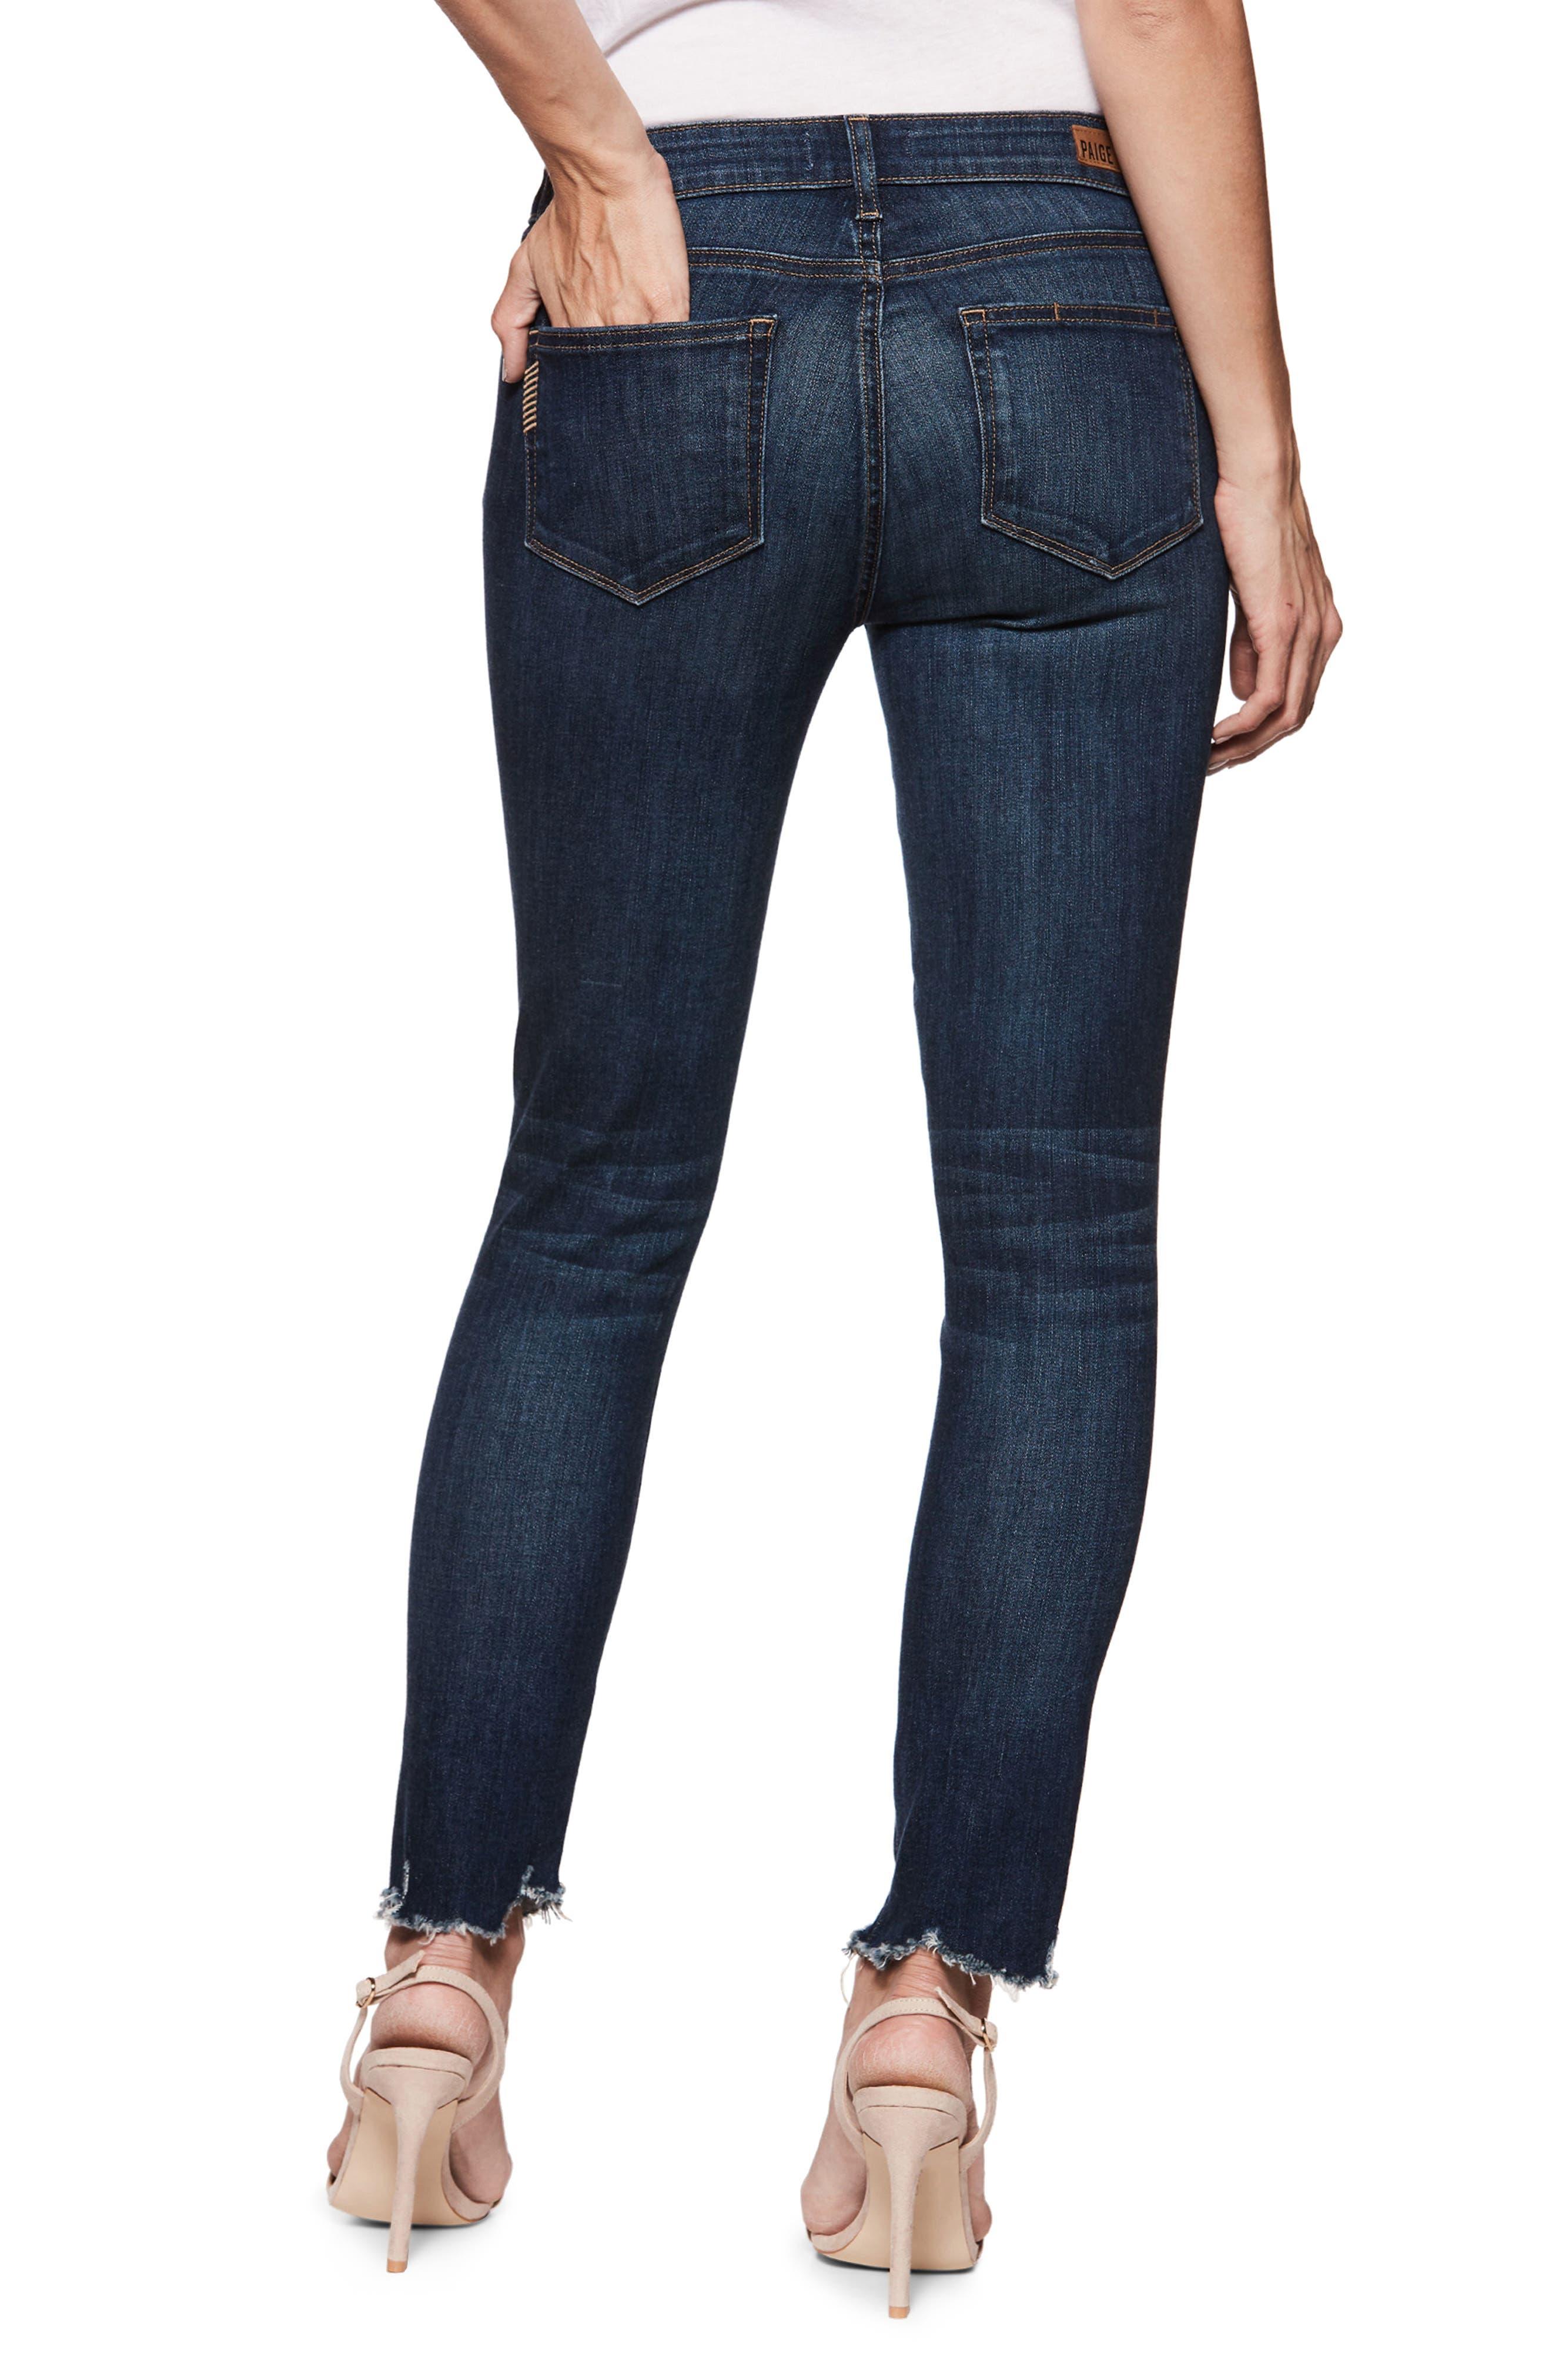 Verdugo Transcend Vintage Ankle Skinny Jeans,                             Alternate thumbnail 2, color,                             BARTON